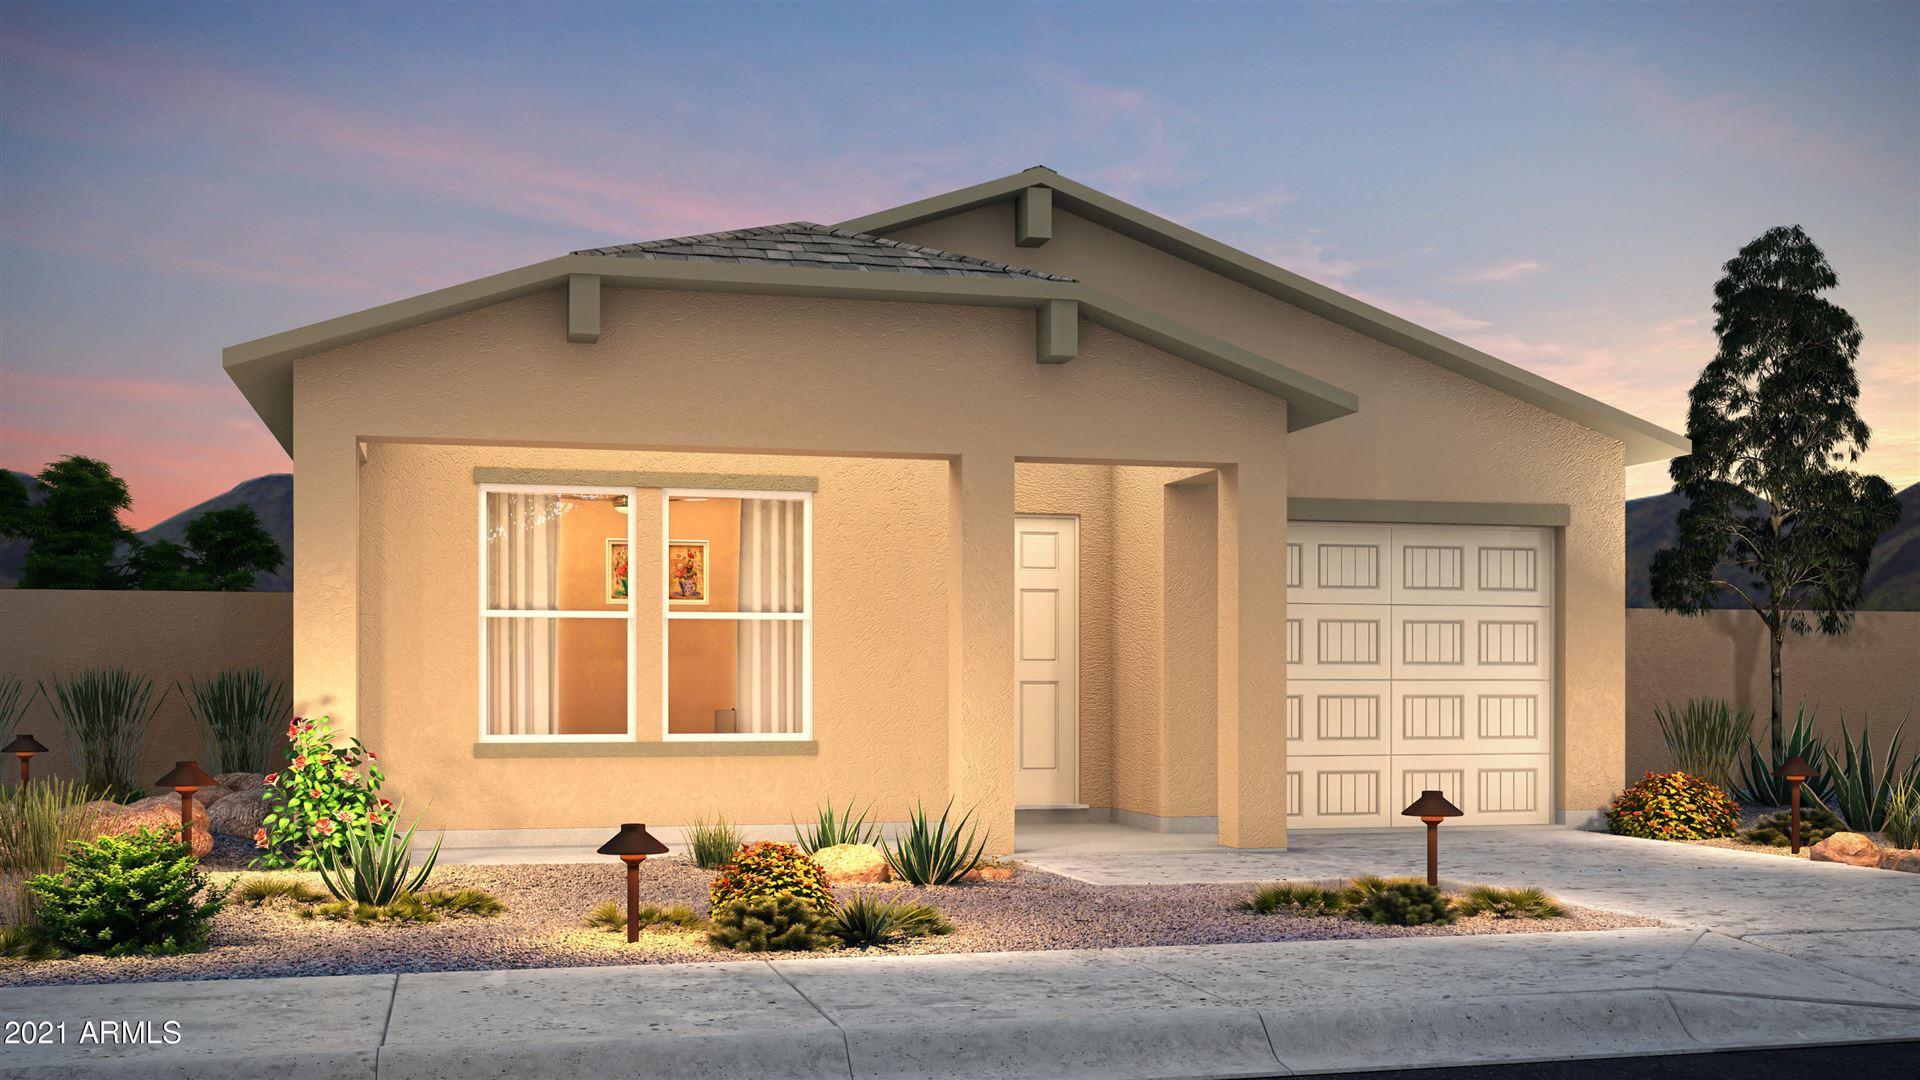 Photo of 467 W Hilquit Drive, Morristown, AZ 85342 (MLS # 6190302)